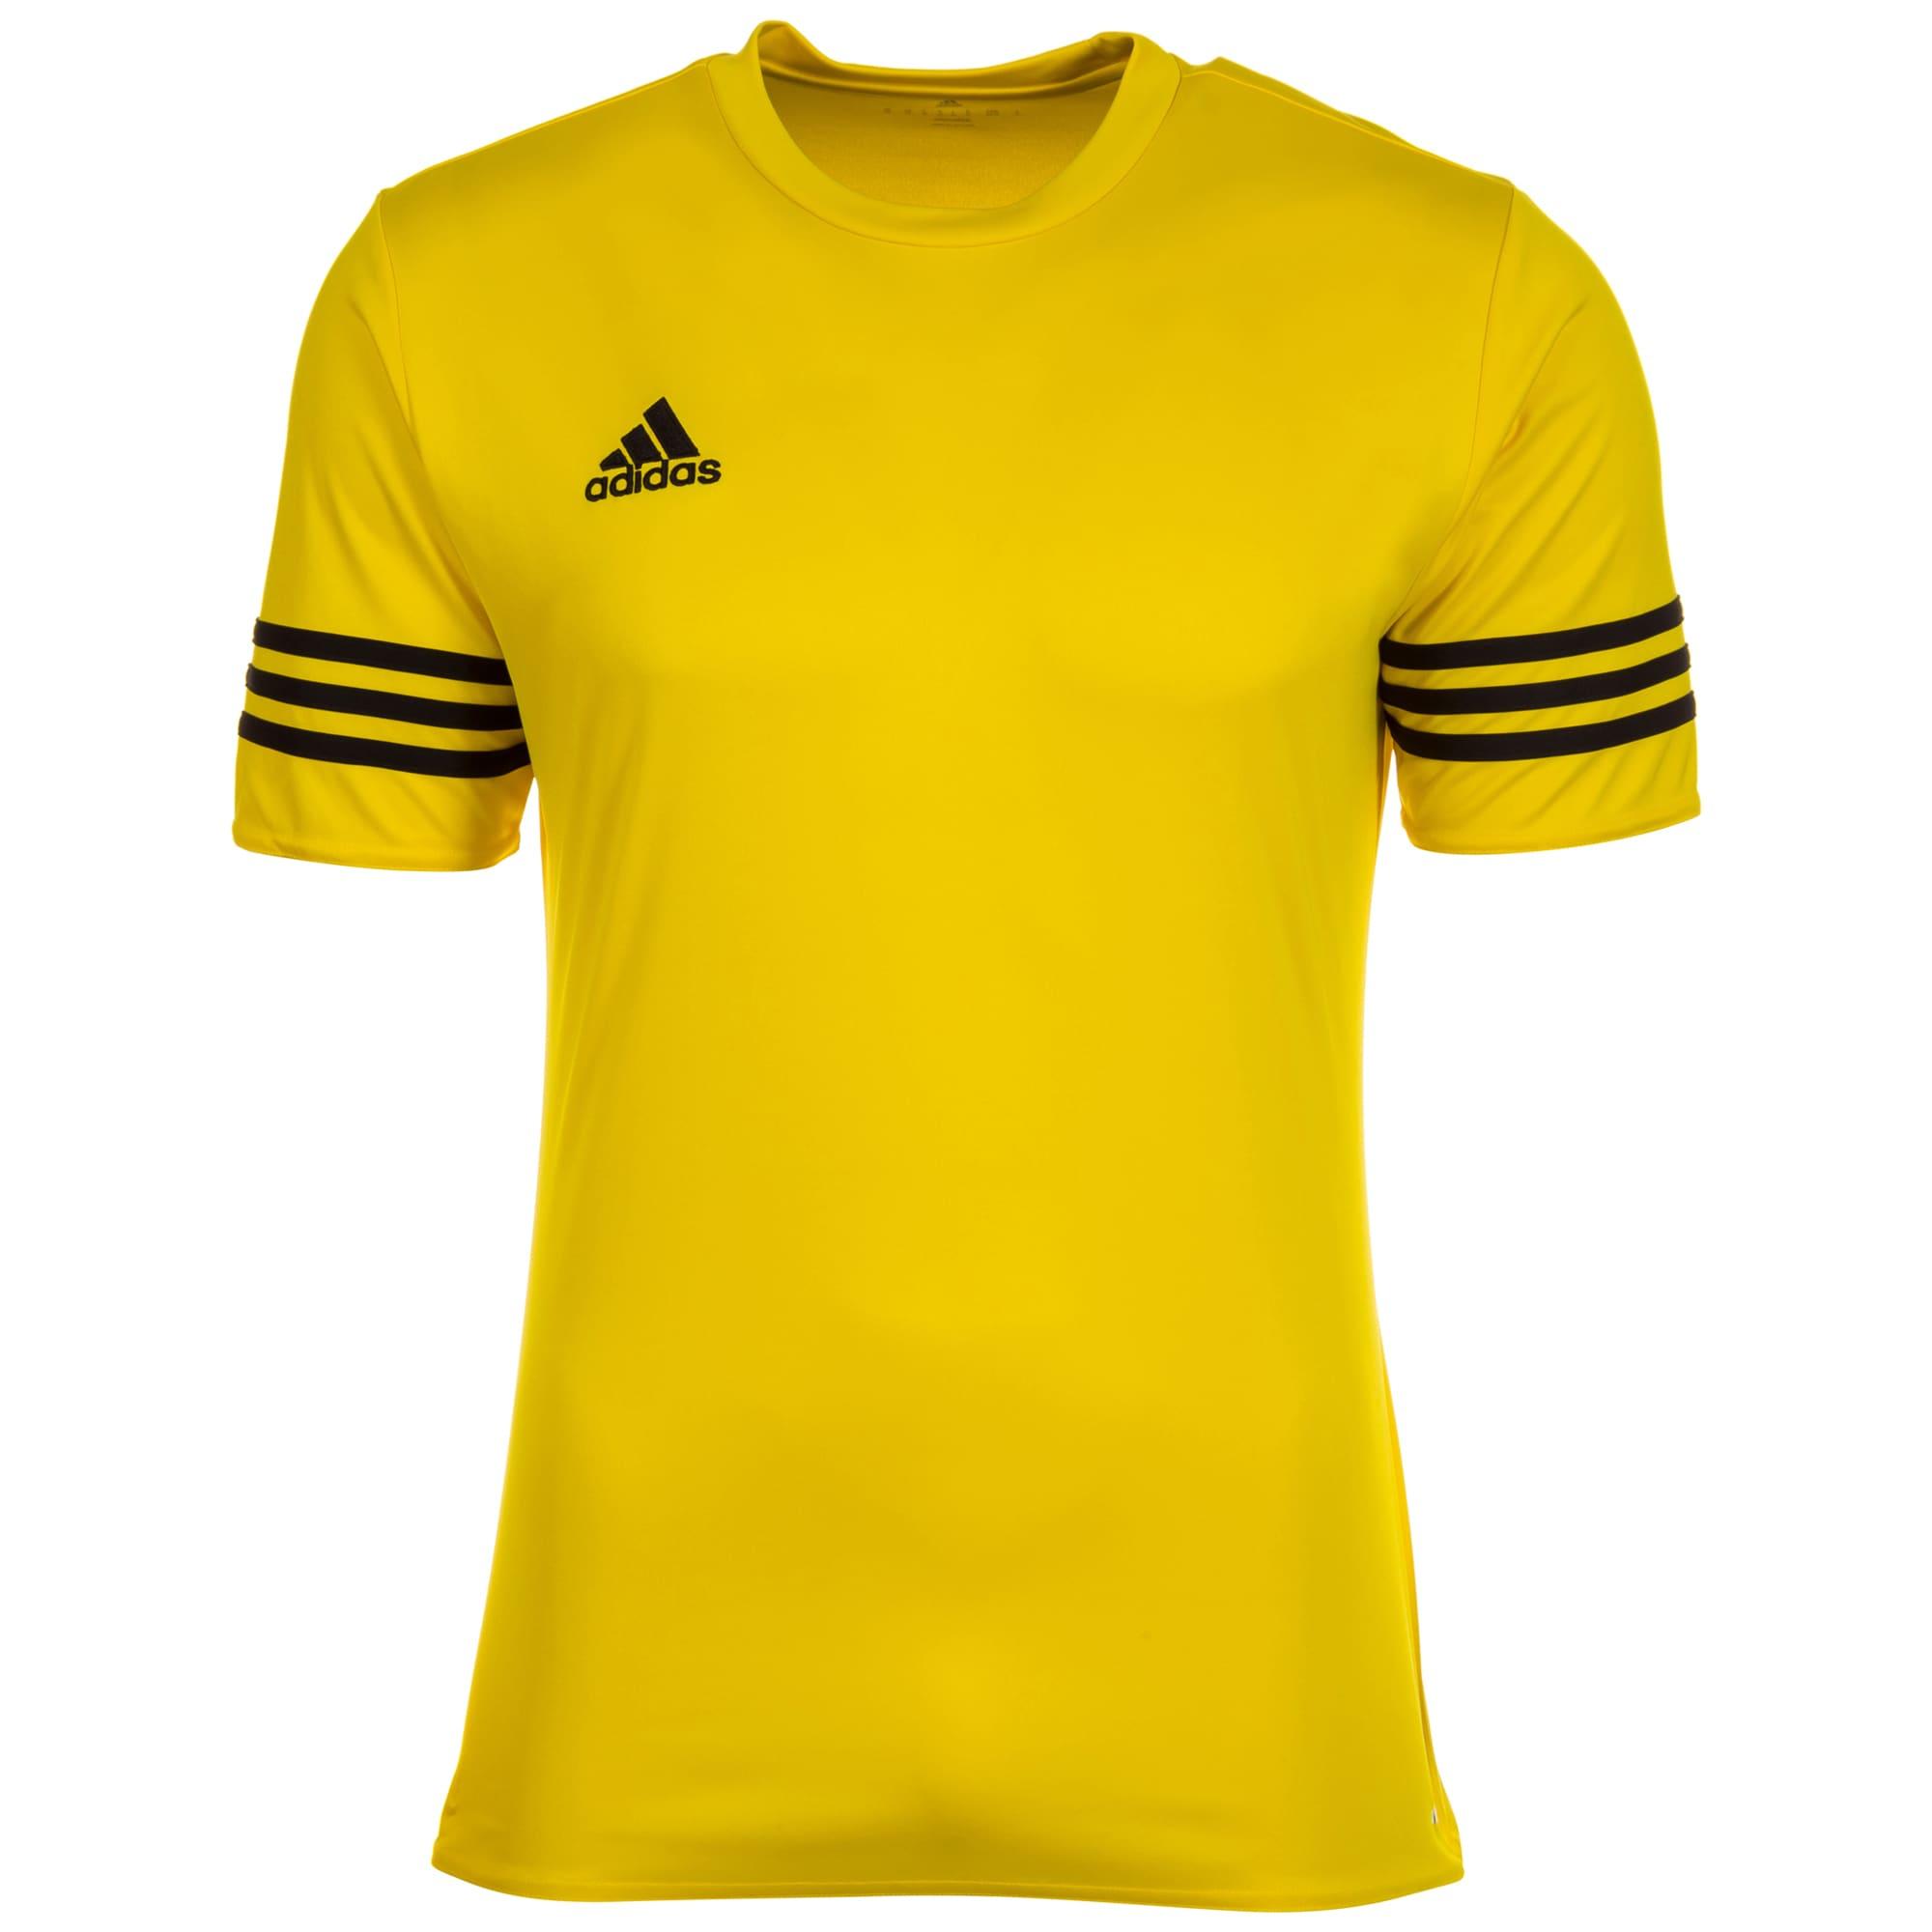 'Entrada 14' Fußballtrikot   Sportbekleidung > Trikots > Fußballtrikots   ADIDAS PERFORMANCE